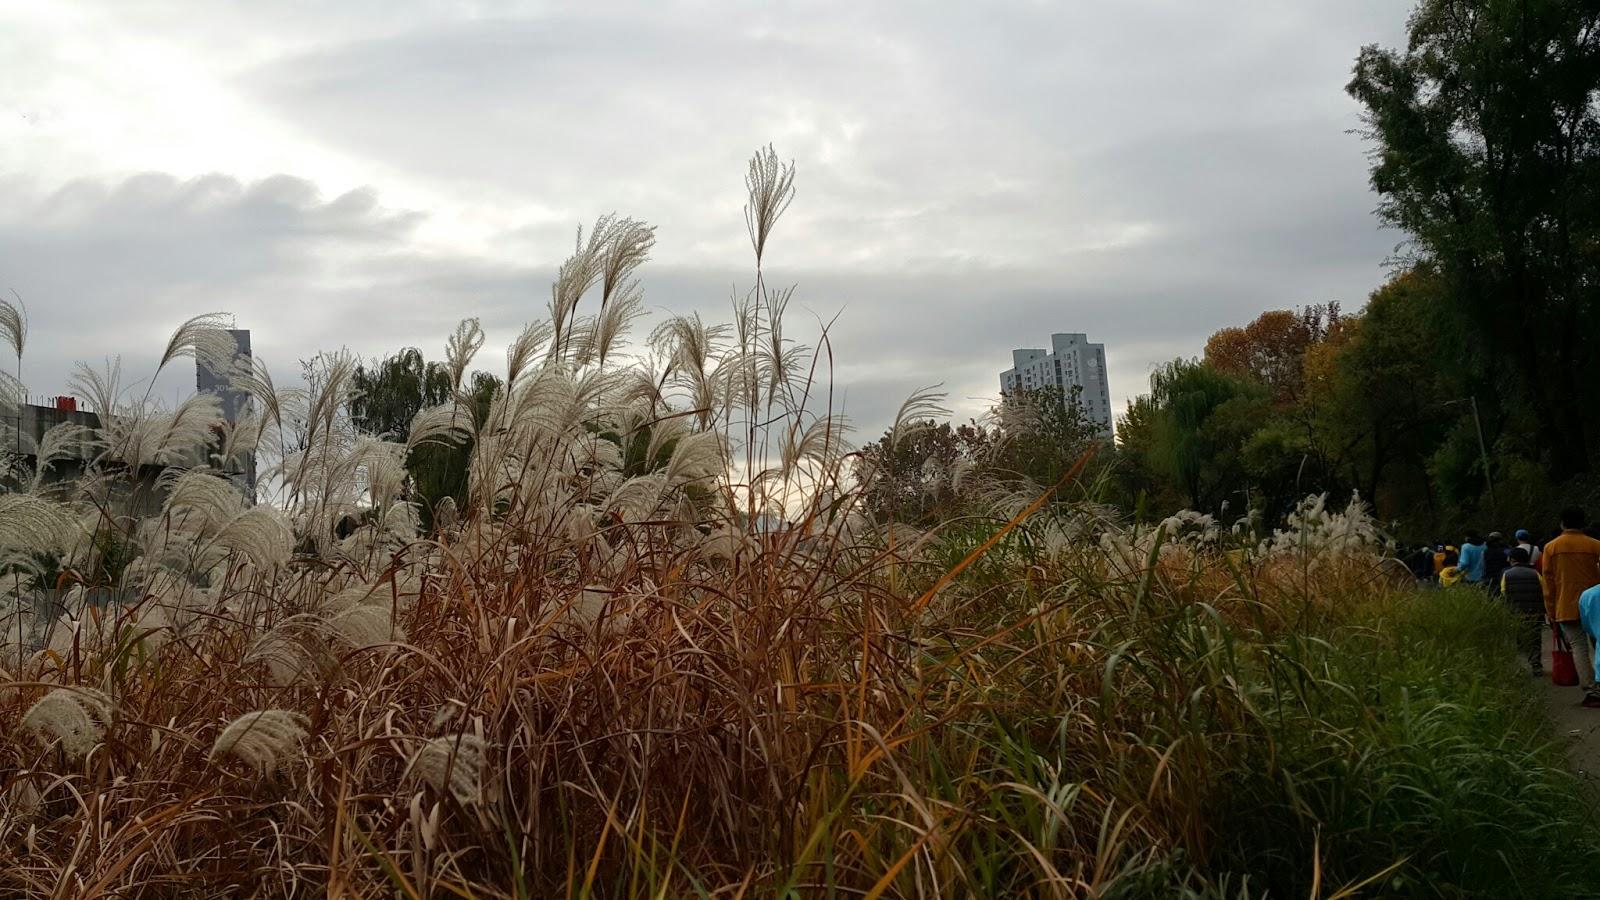 Sights of soft reeds